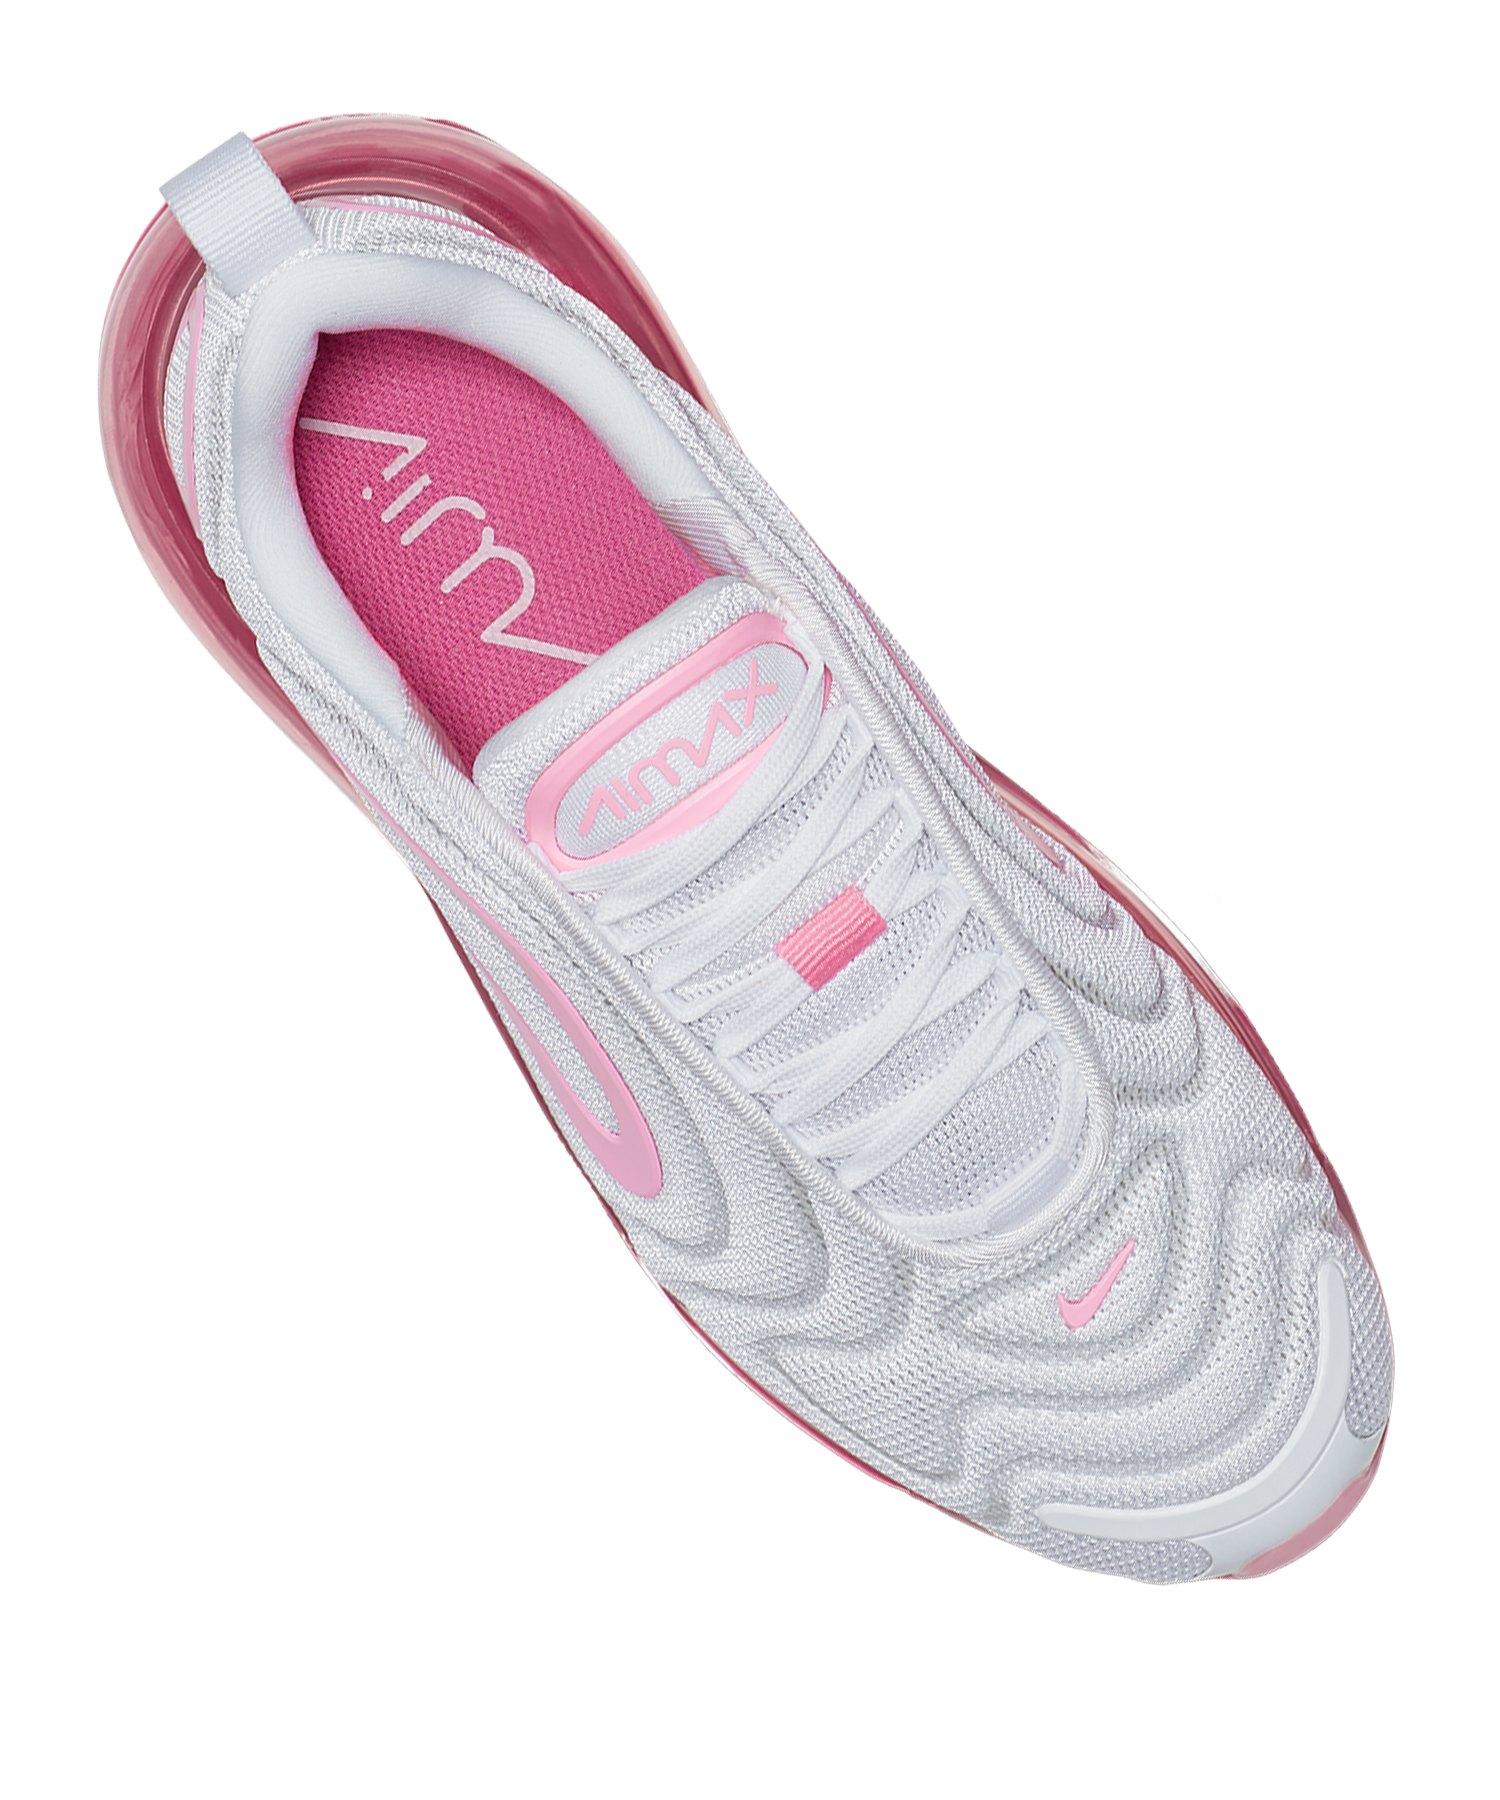 Nike Air Max 720 Sneaker Damen Weiss Pink F103